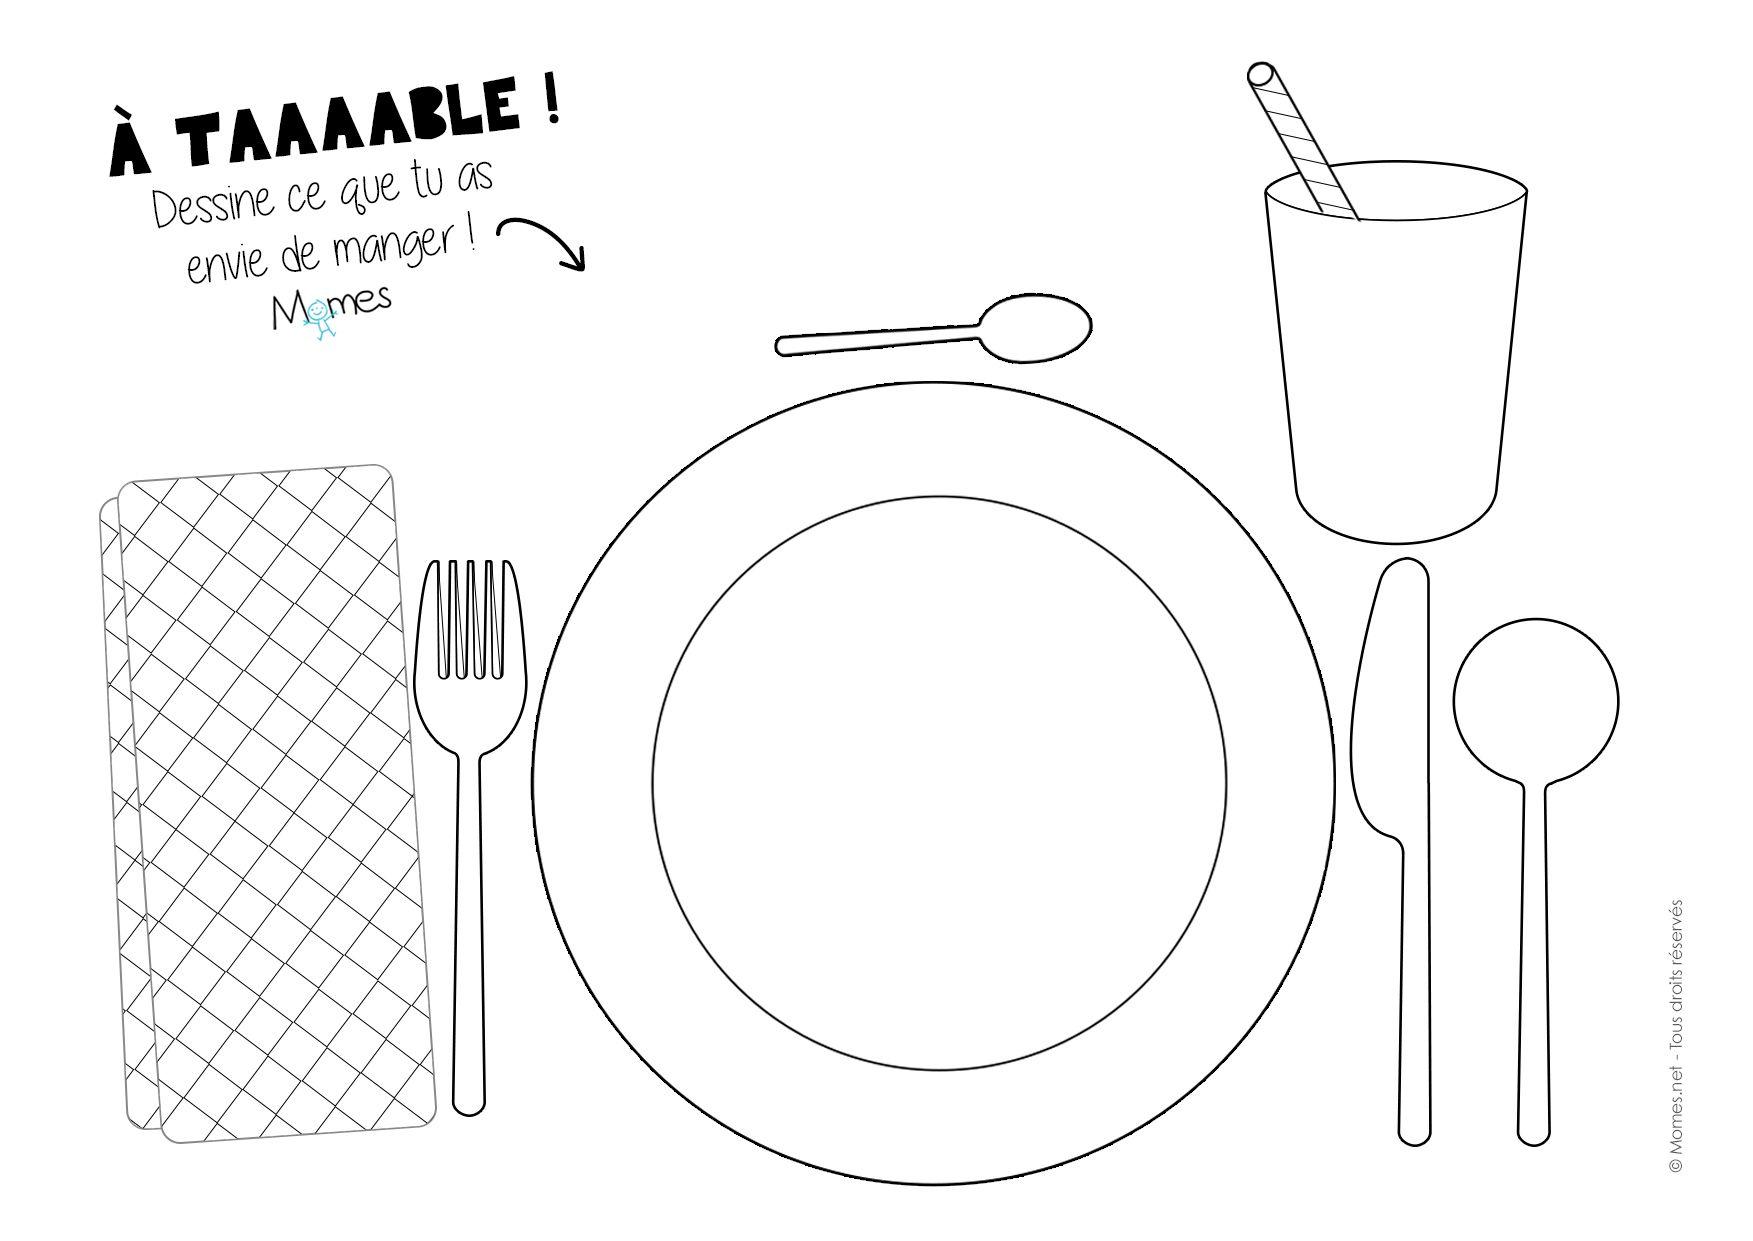 set de table dessin repas